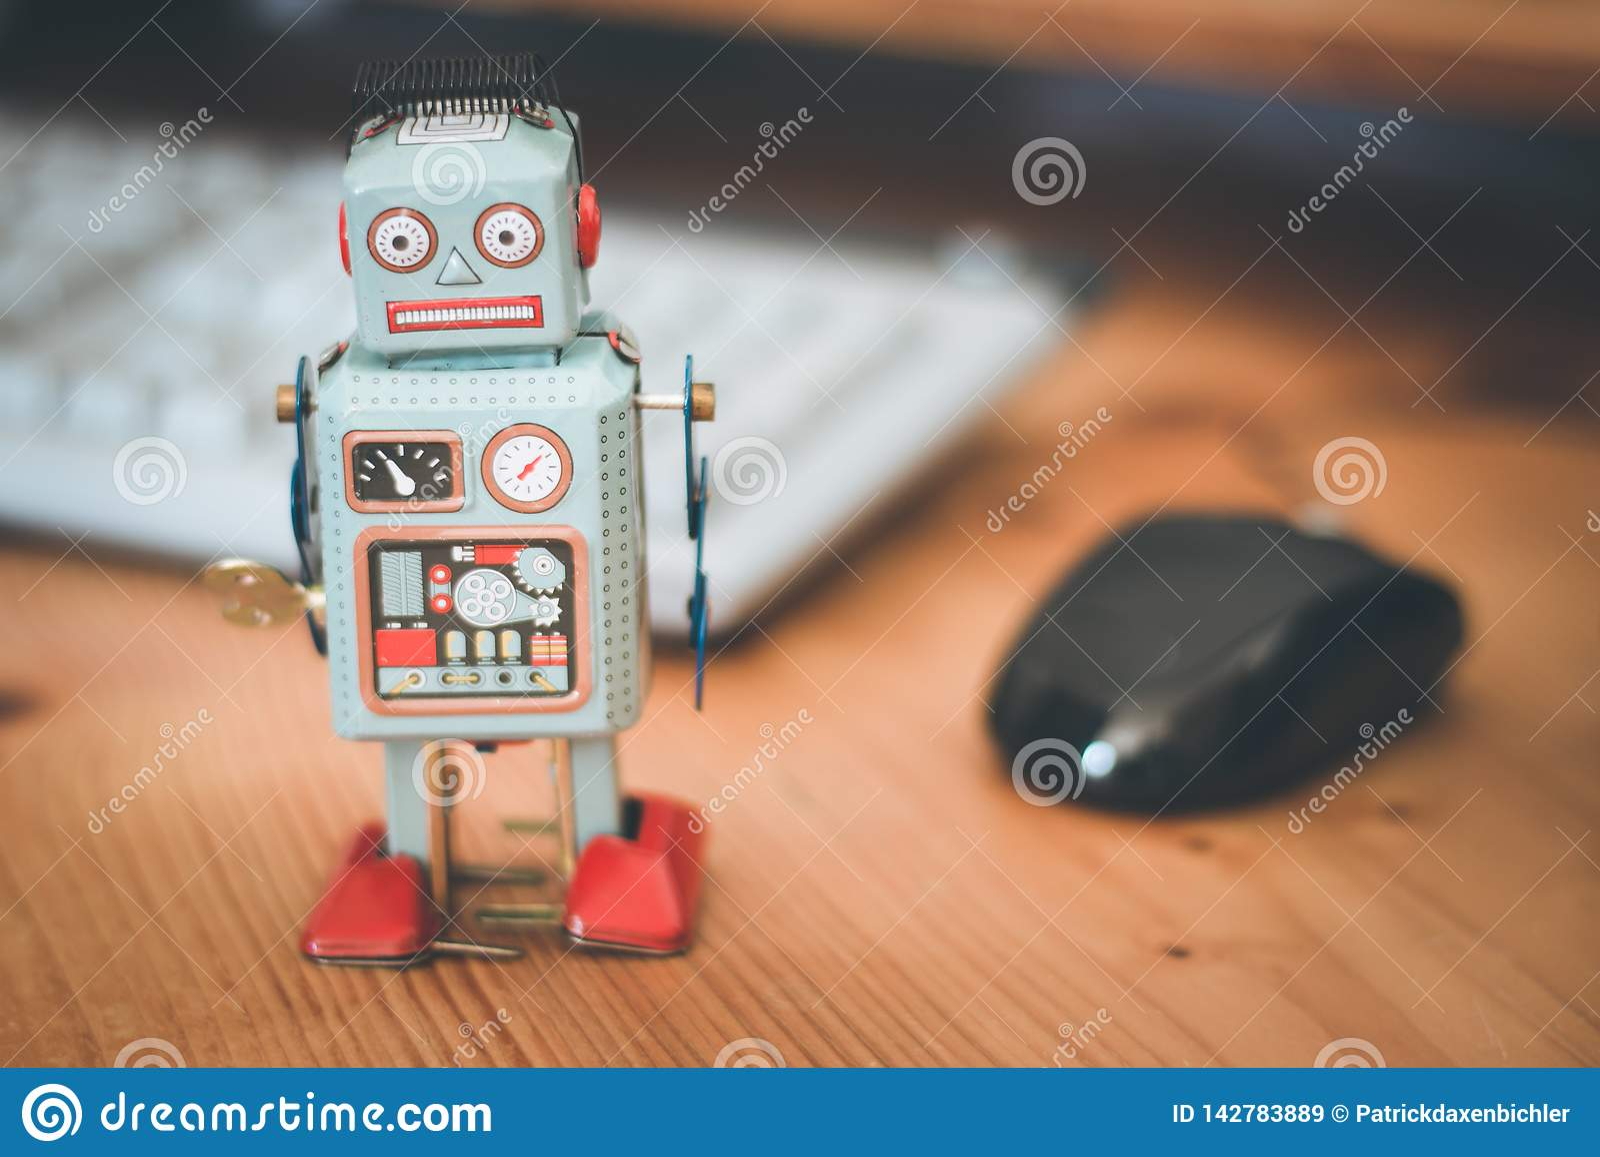 Símbolo para um bot do bate-papo ou bot social e algoritmos, teclado